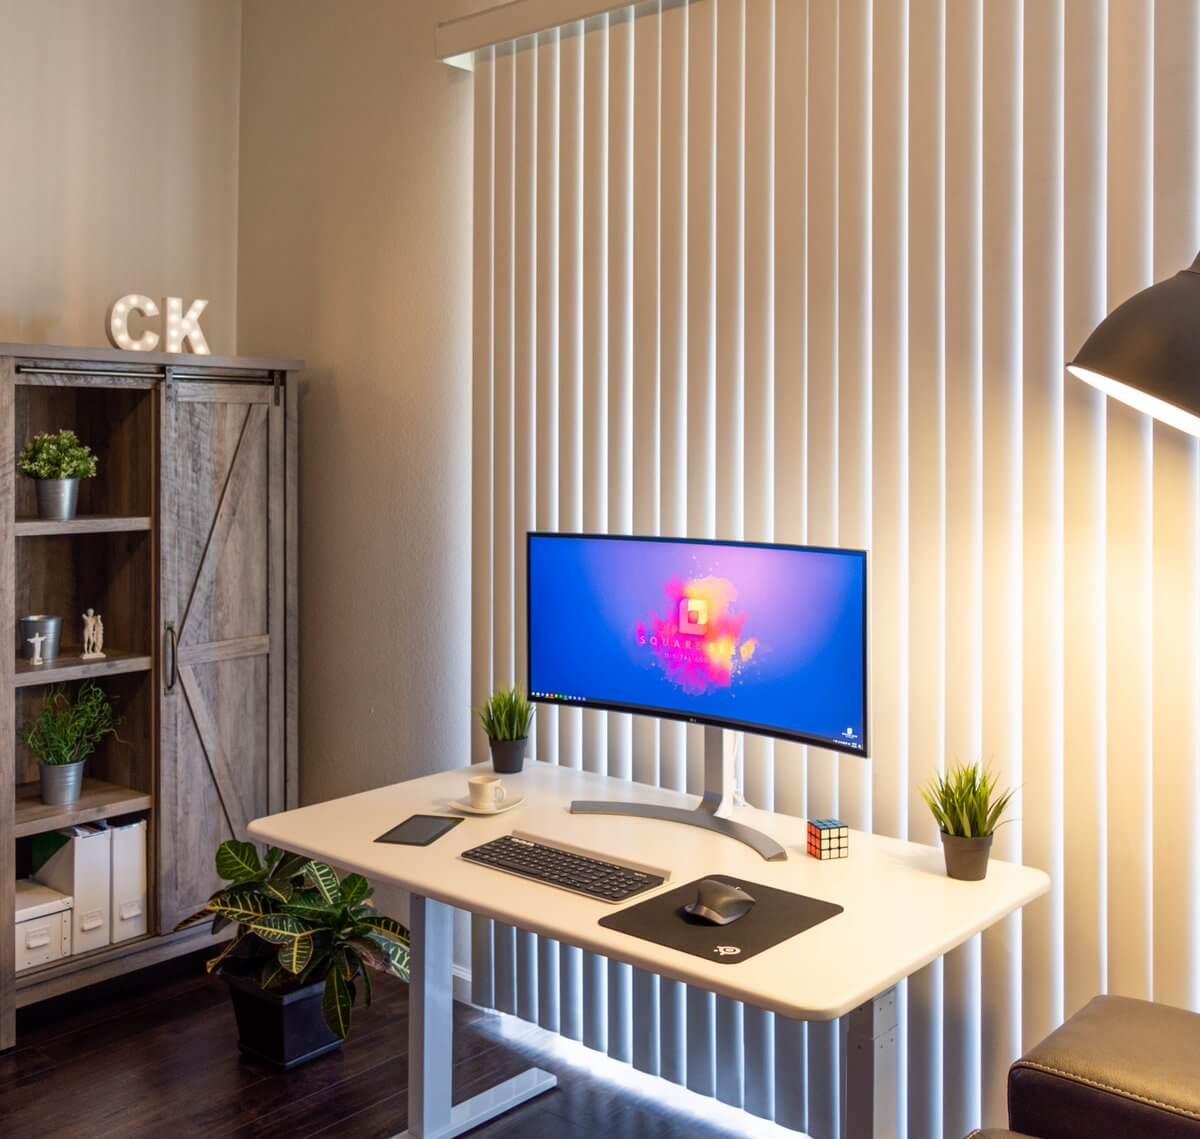 Smartdesk 2 - Autonomous standing desk review